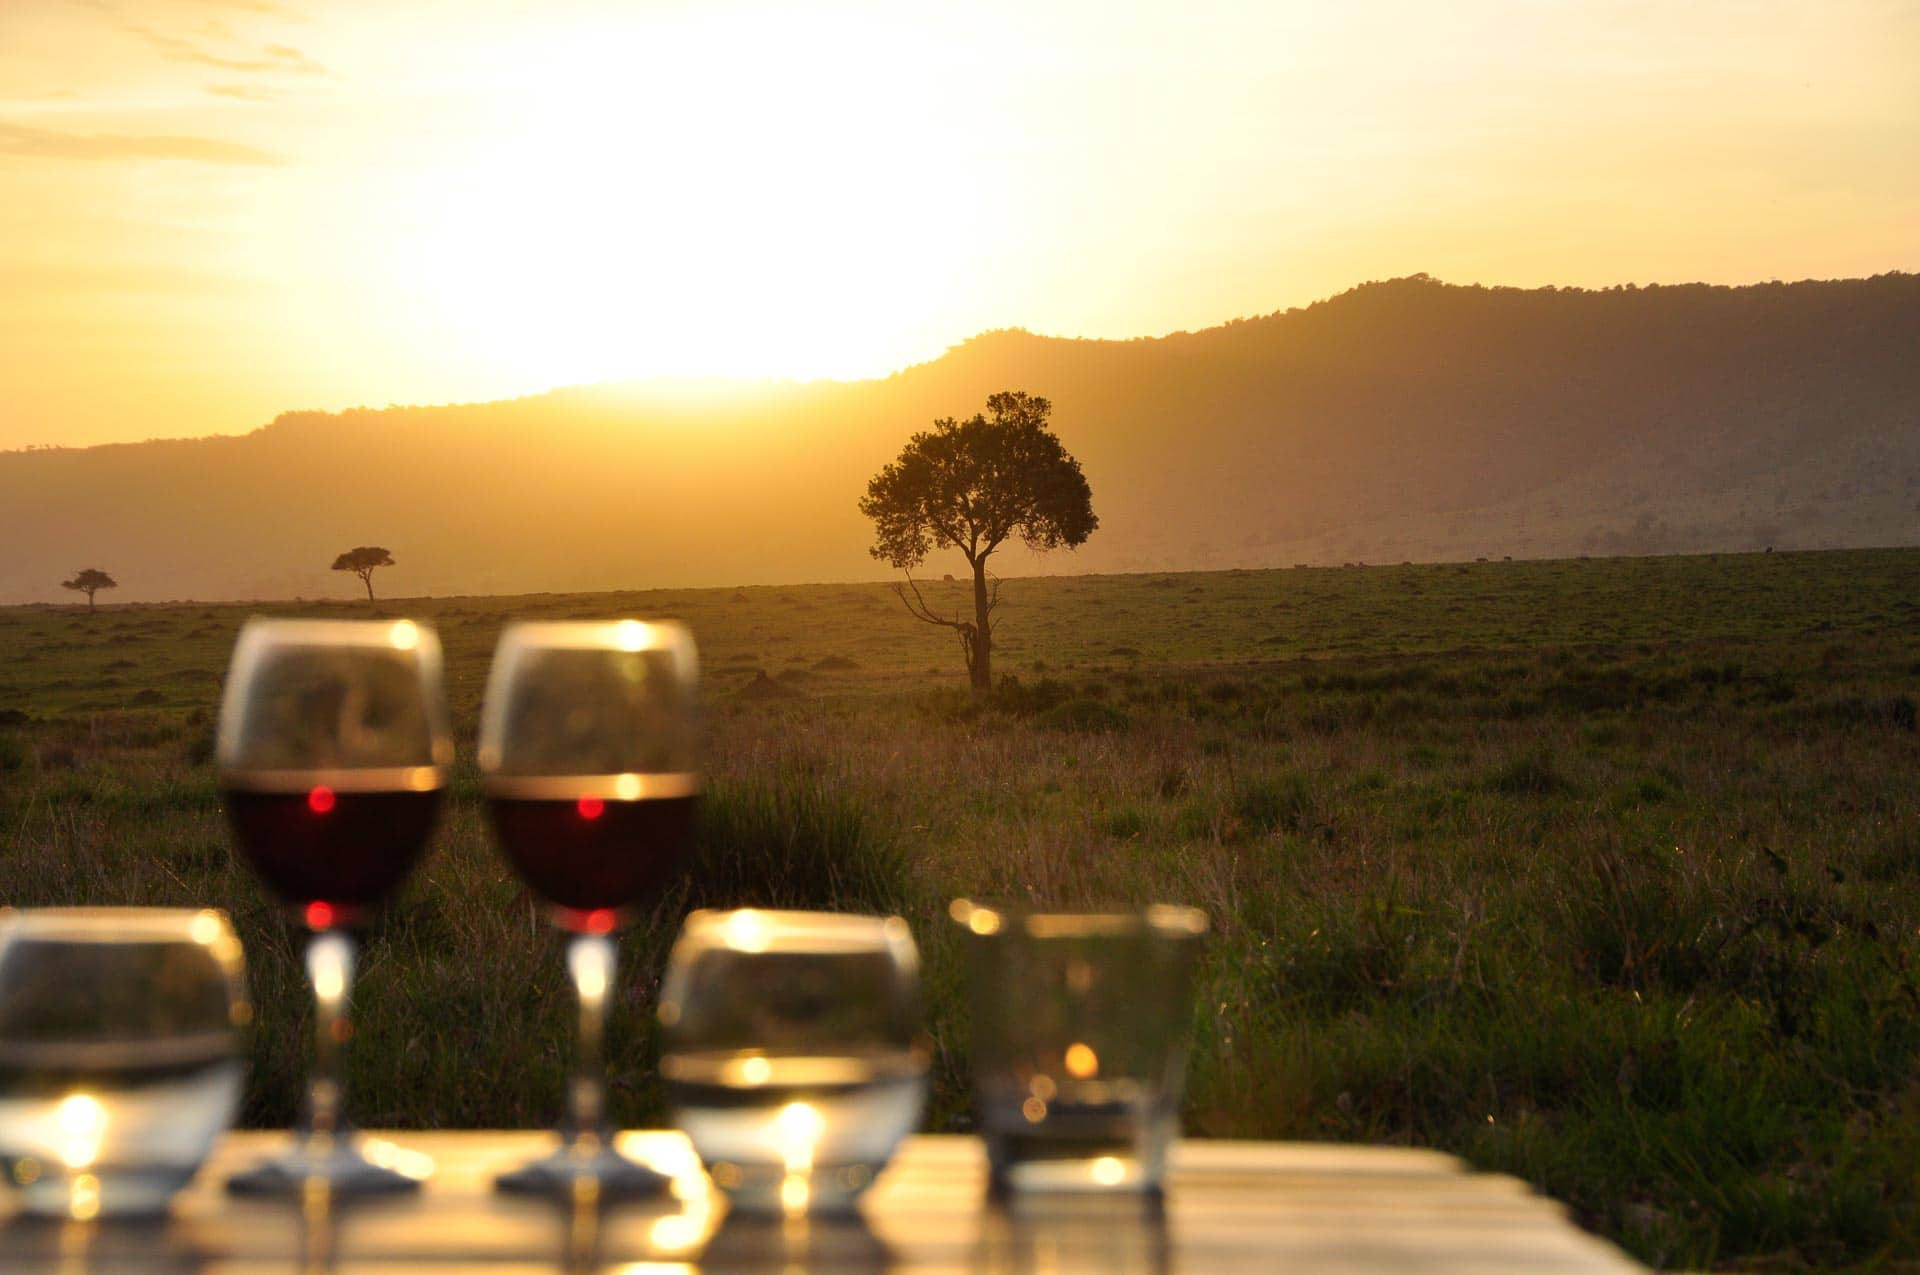 Masai-Mara-Sundowner-Kenia-Globetrotter-Select-8